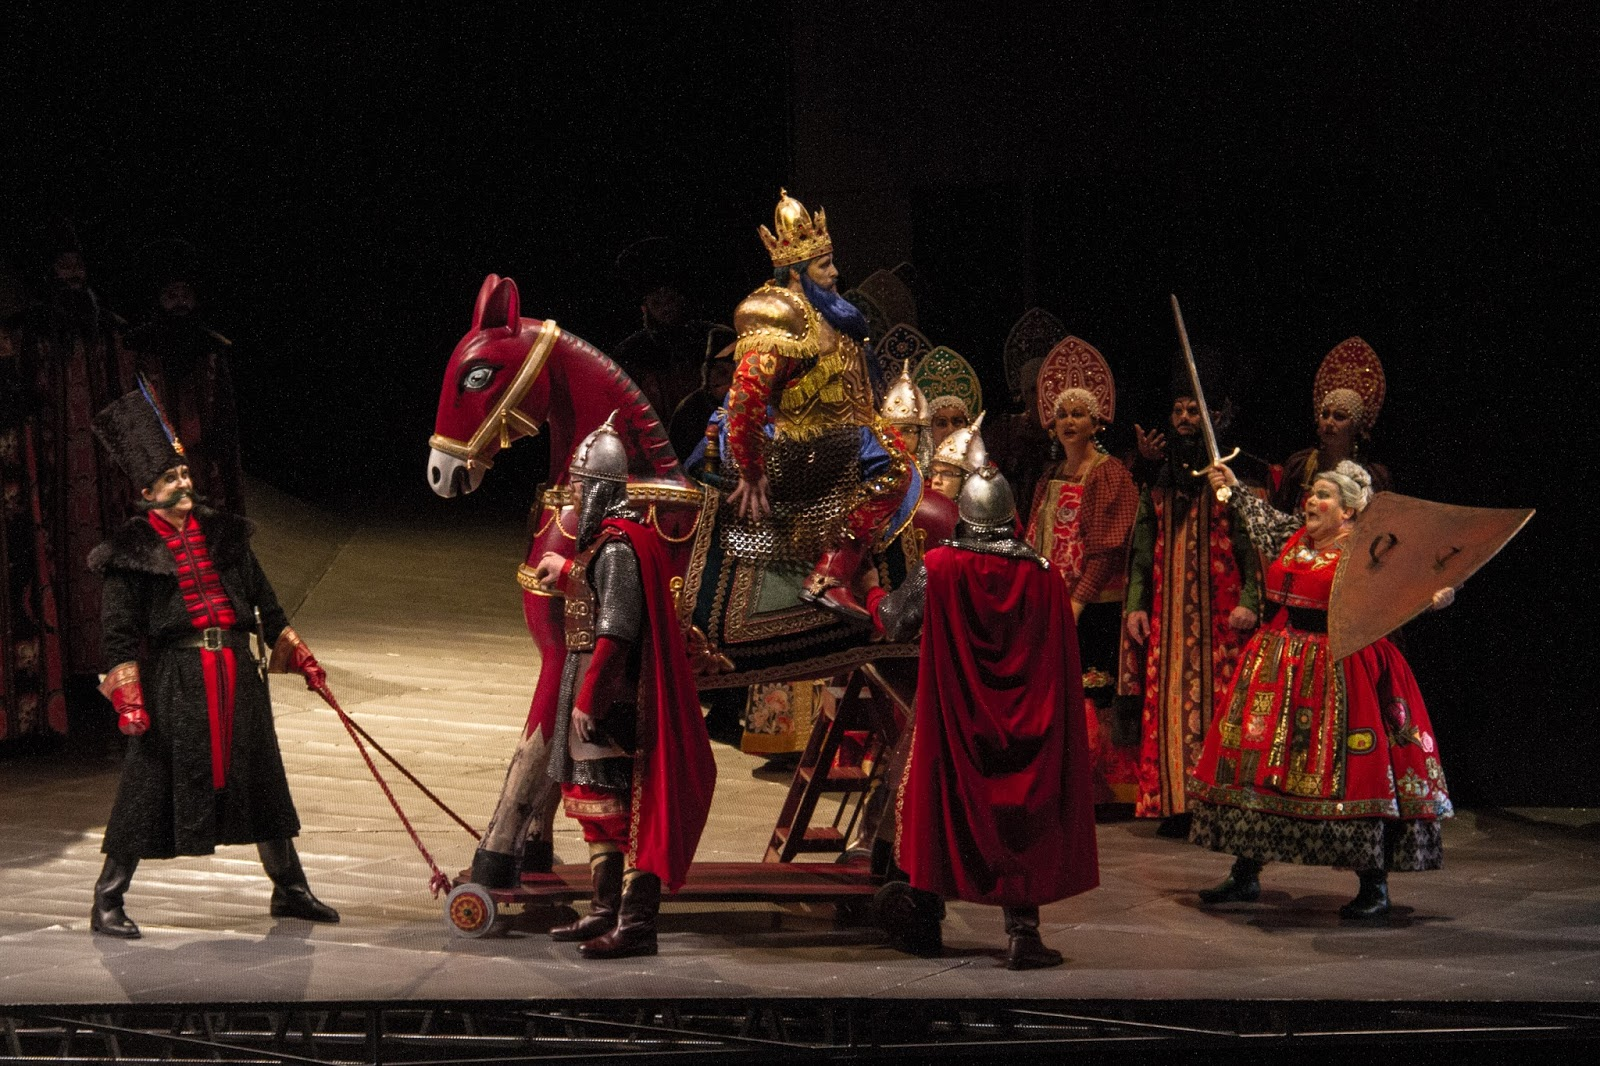 King Dodon. The Tale of the Golden Cockerel, Alexander Sergeevich Pushkin